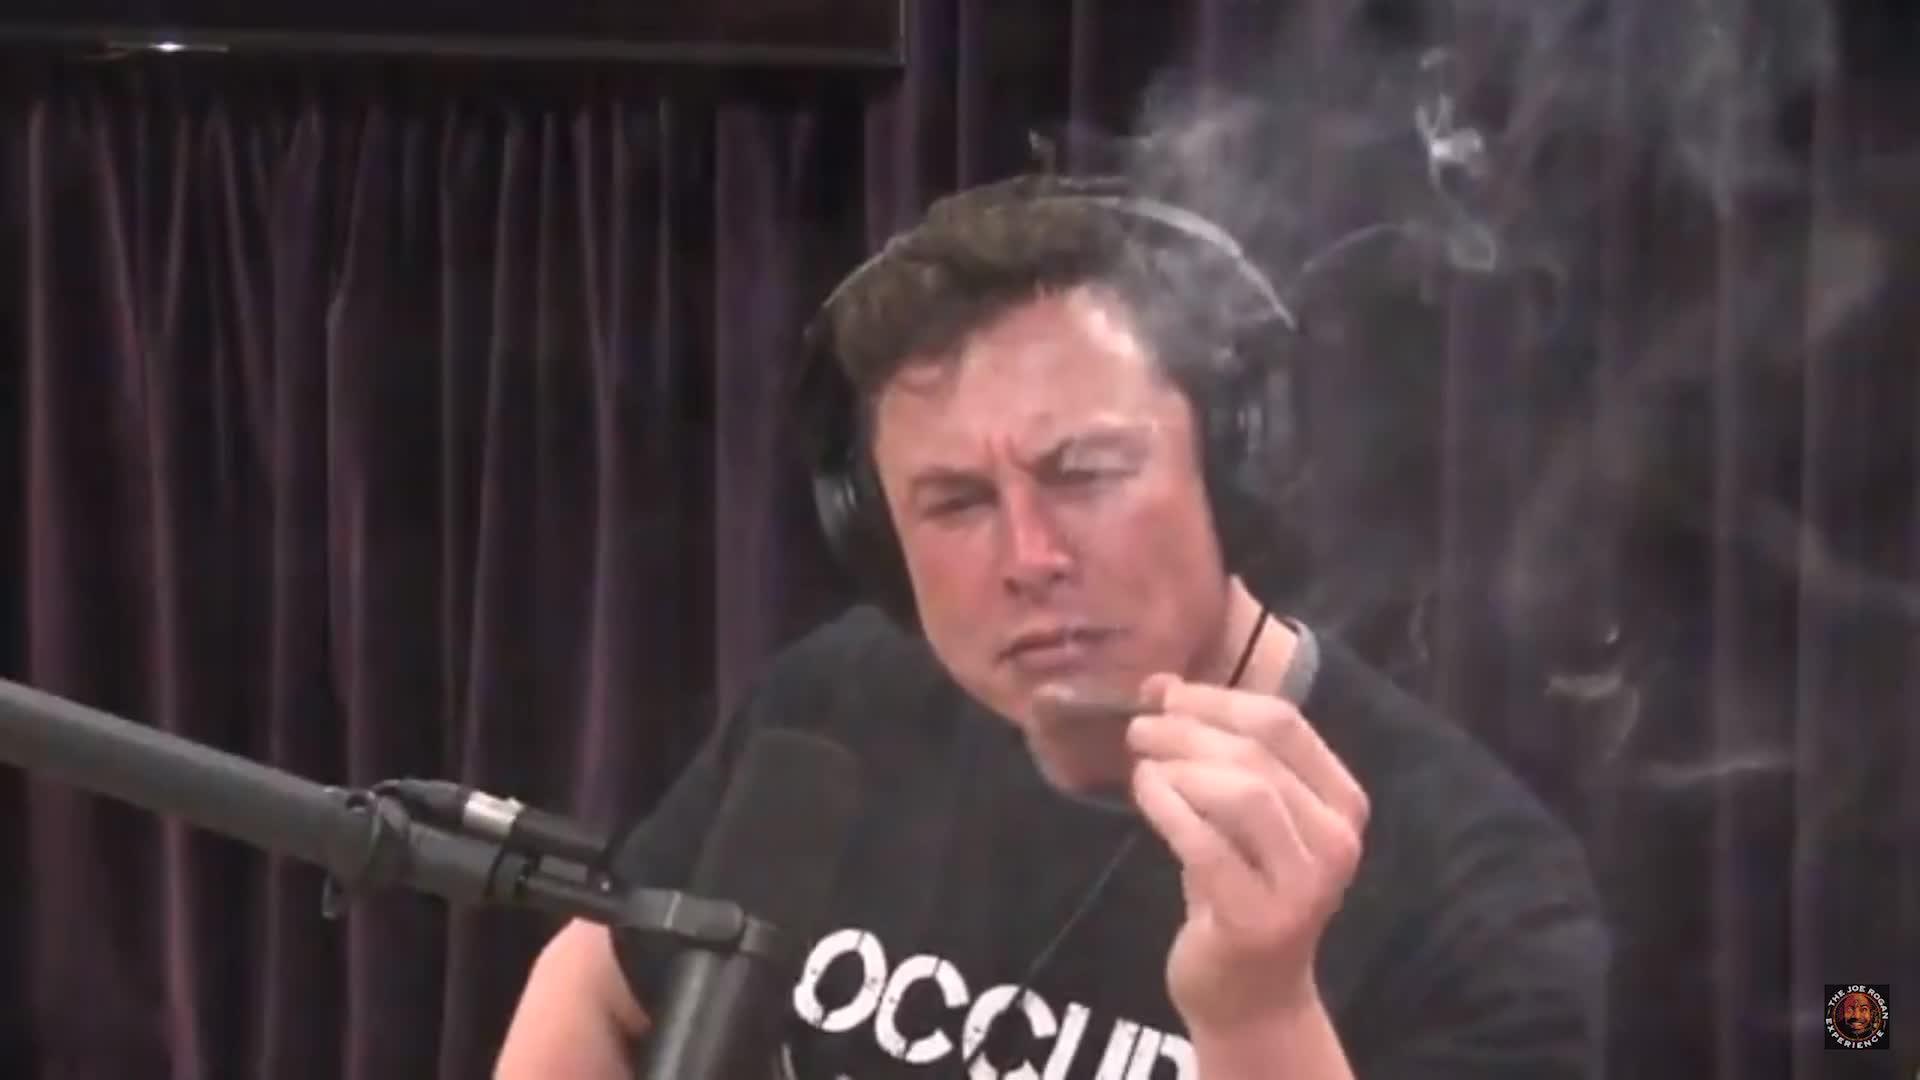 Elon musk smoking, Elon smoking, Elon smoking cigar, Joe Rogan podcast,, Tesla weed, weed, Danklon Musk GIFs